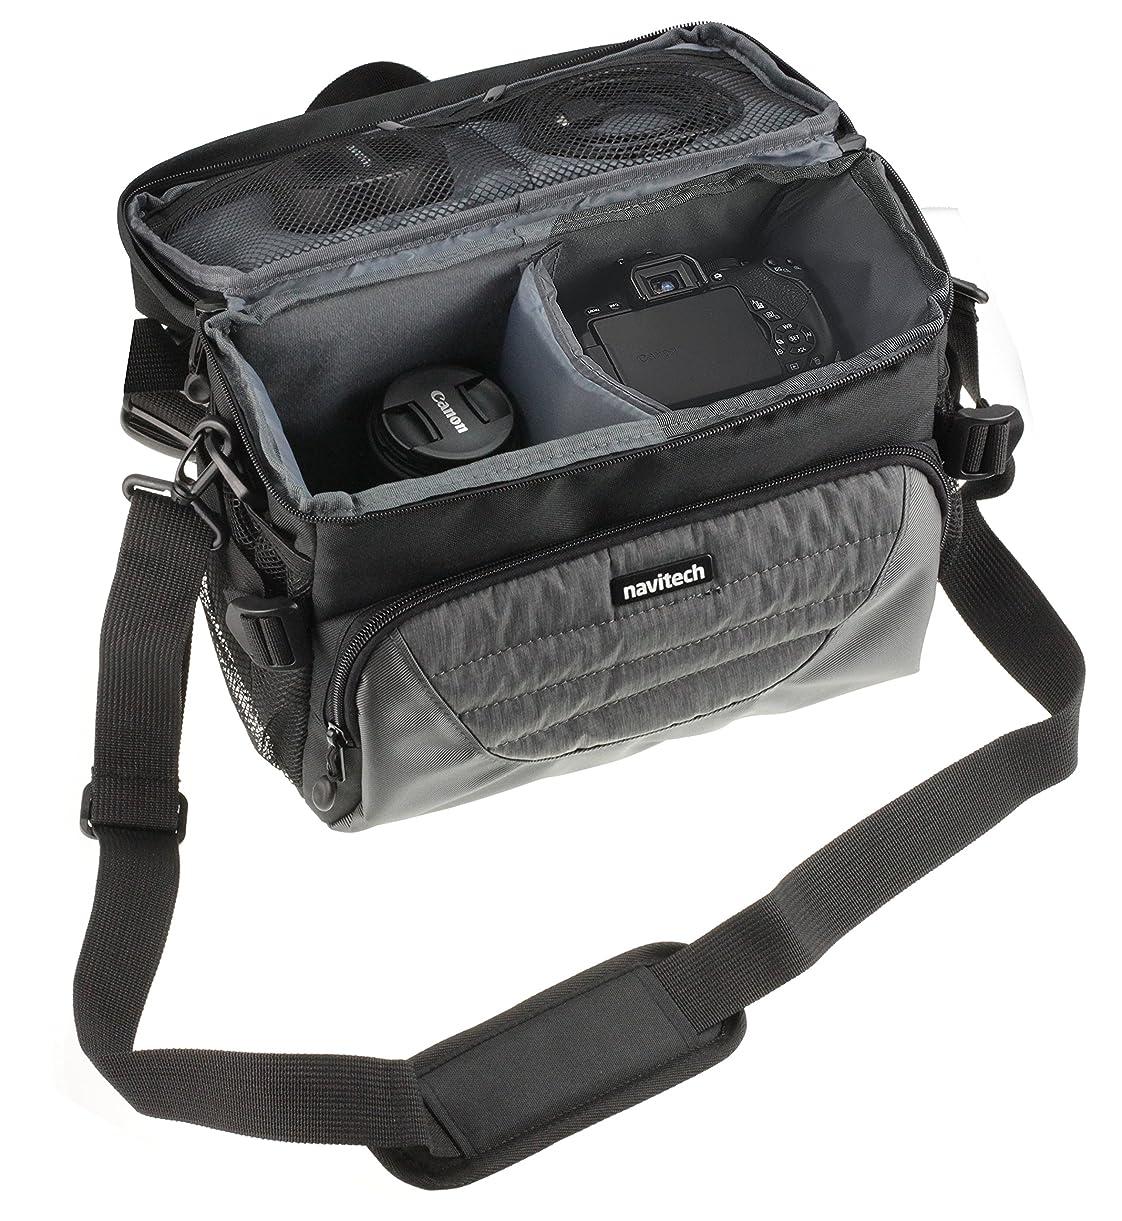 Navitech Grey DSLR & Lens Camera Bag Case Cover Compatible The Nikon D850 cwquj3539